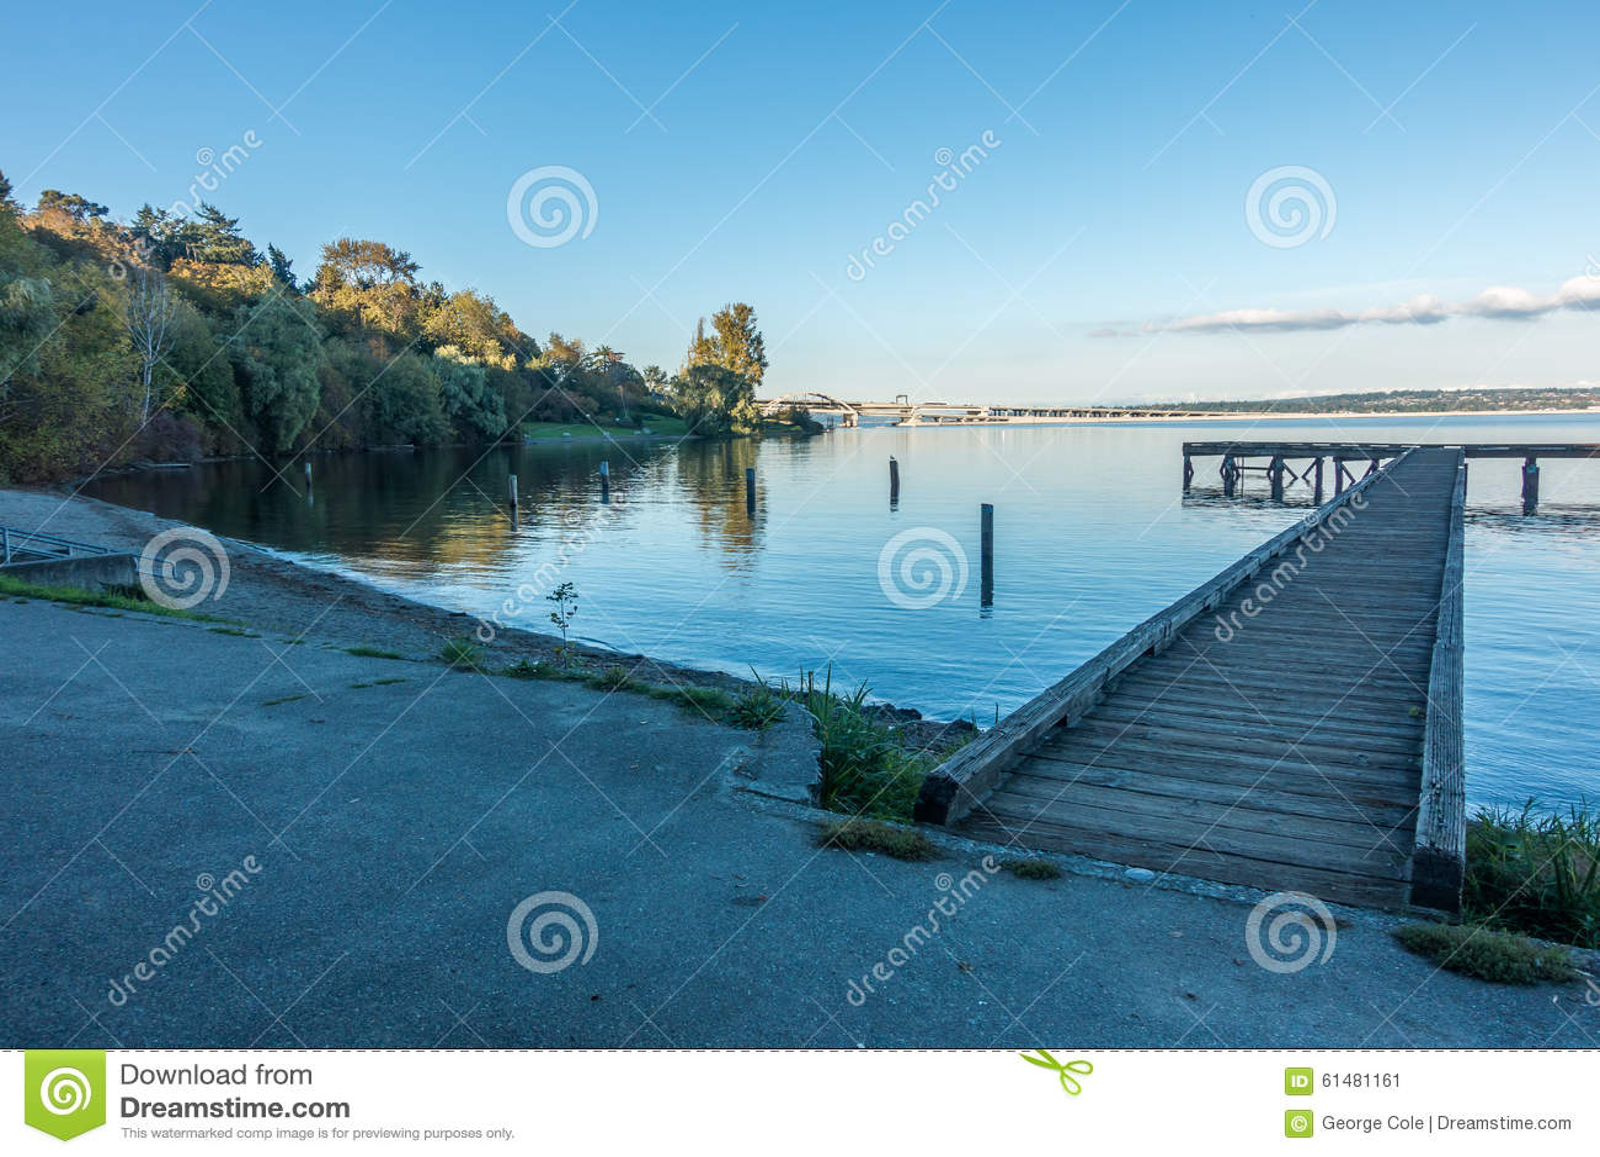 Lake washington pier stock photo image 61481161 for Seattle fishing pier